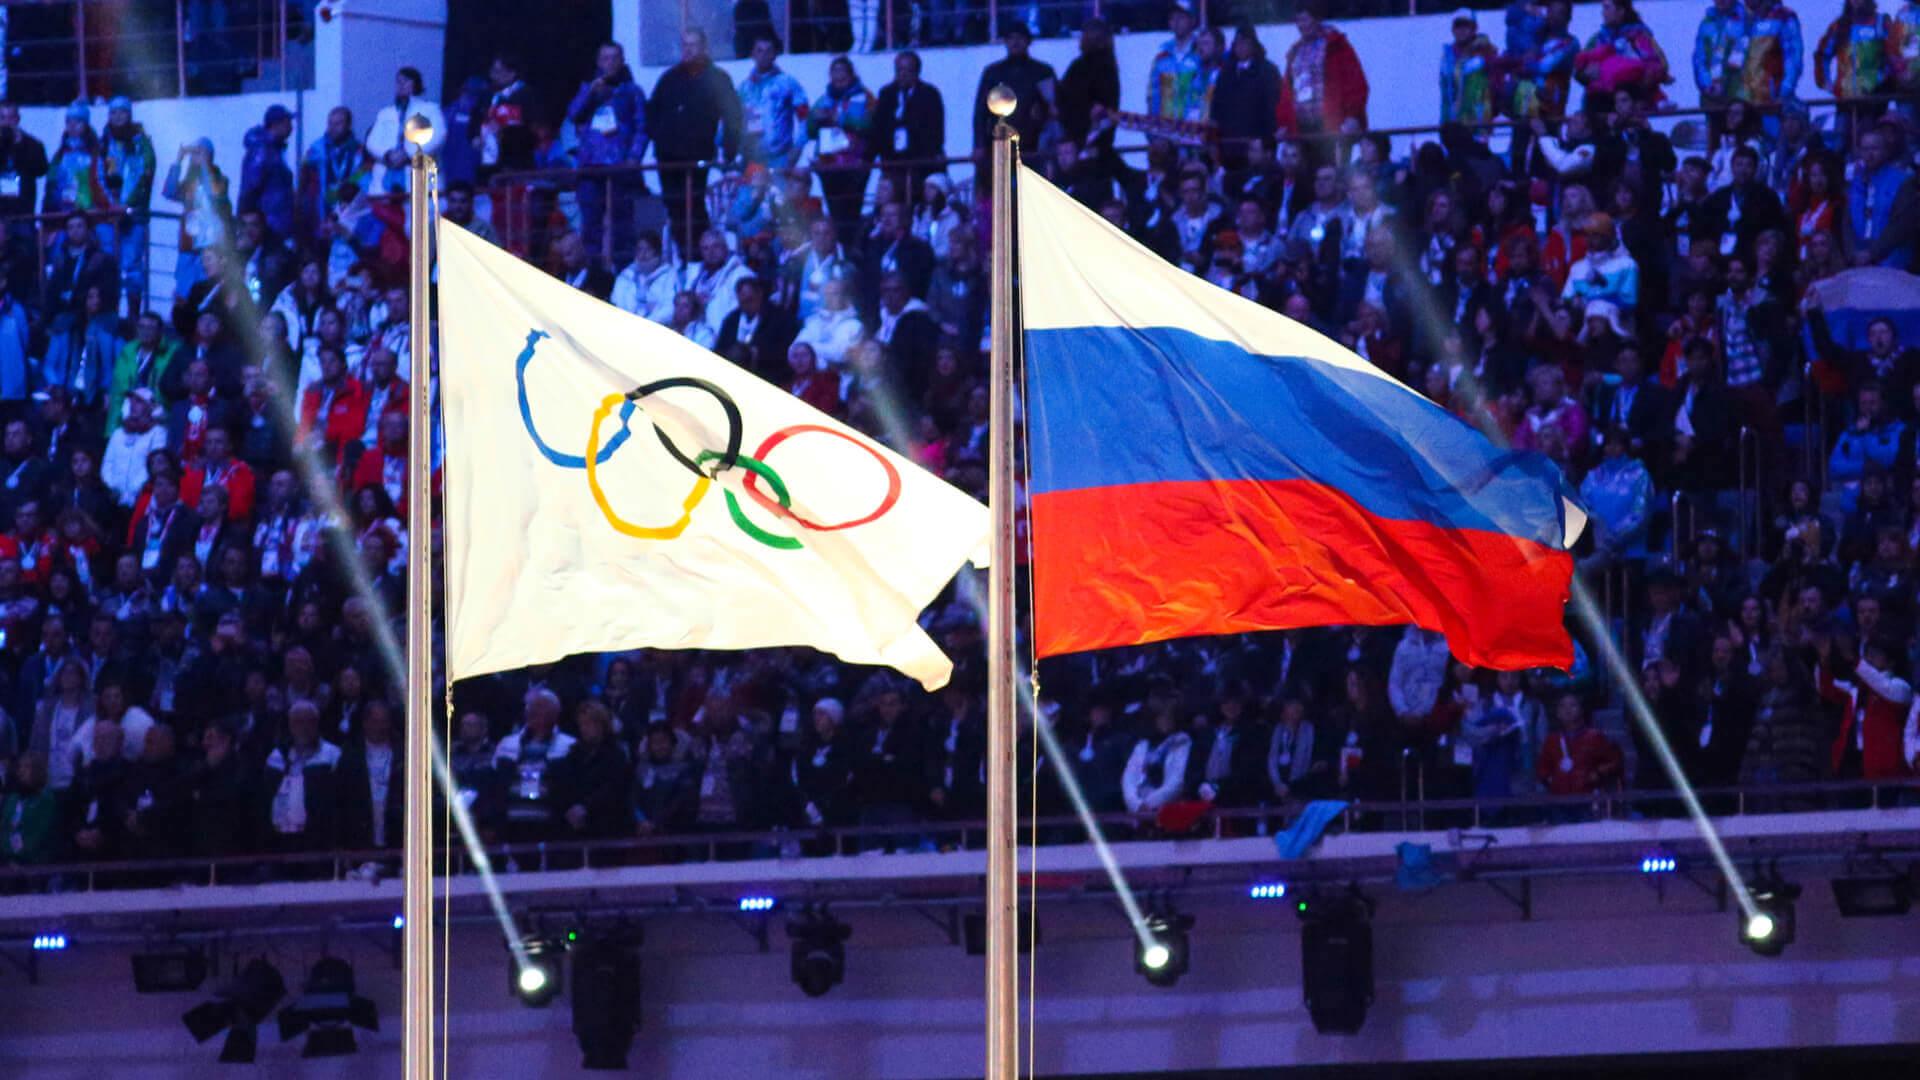 Flaga olimpijska i rosyjska